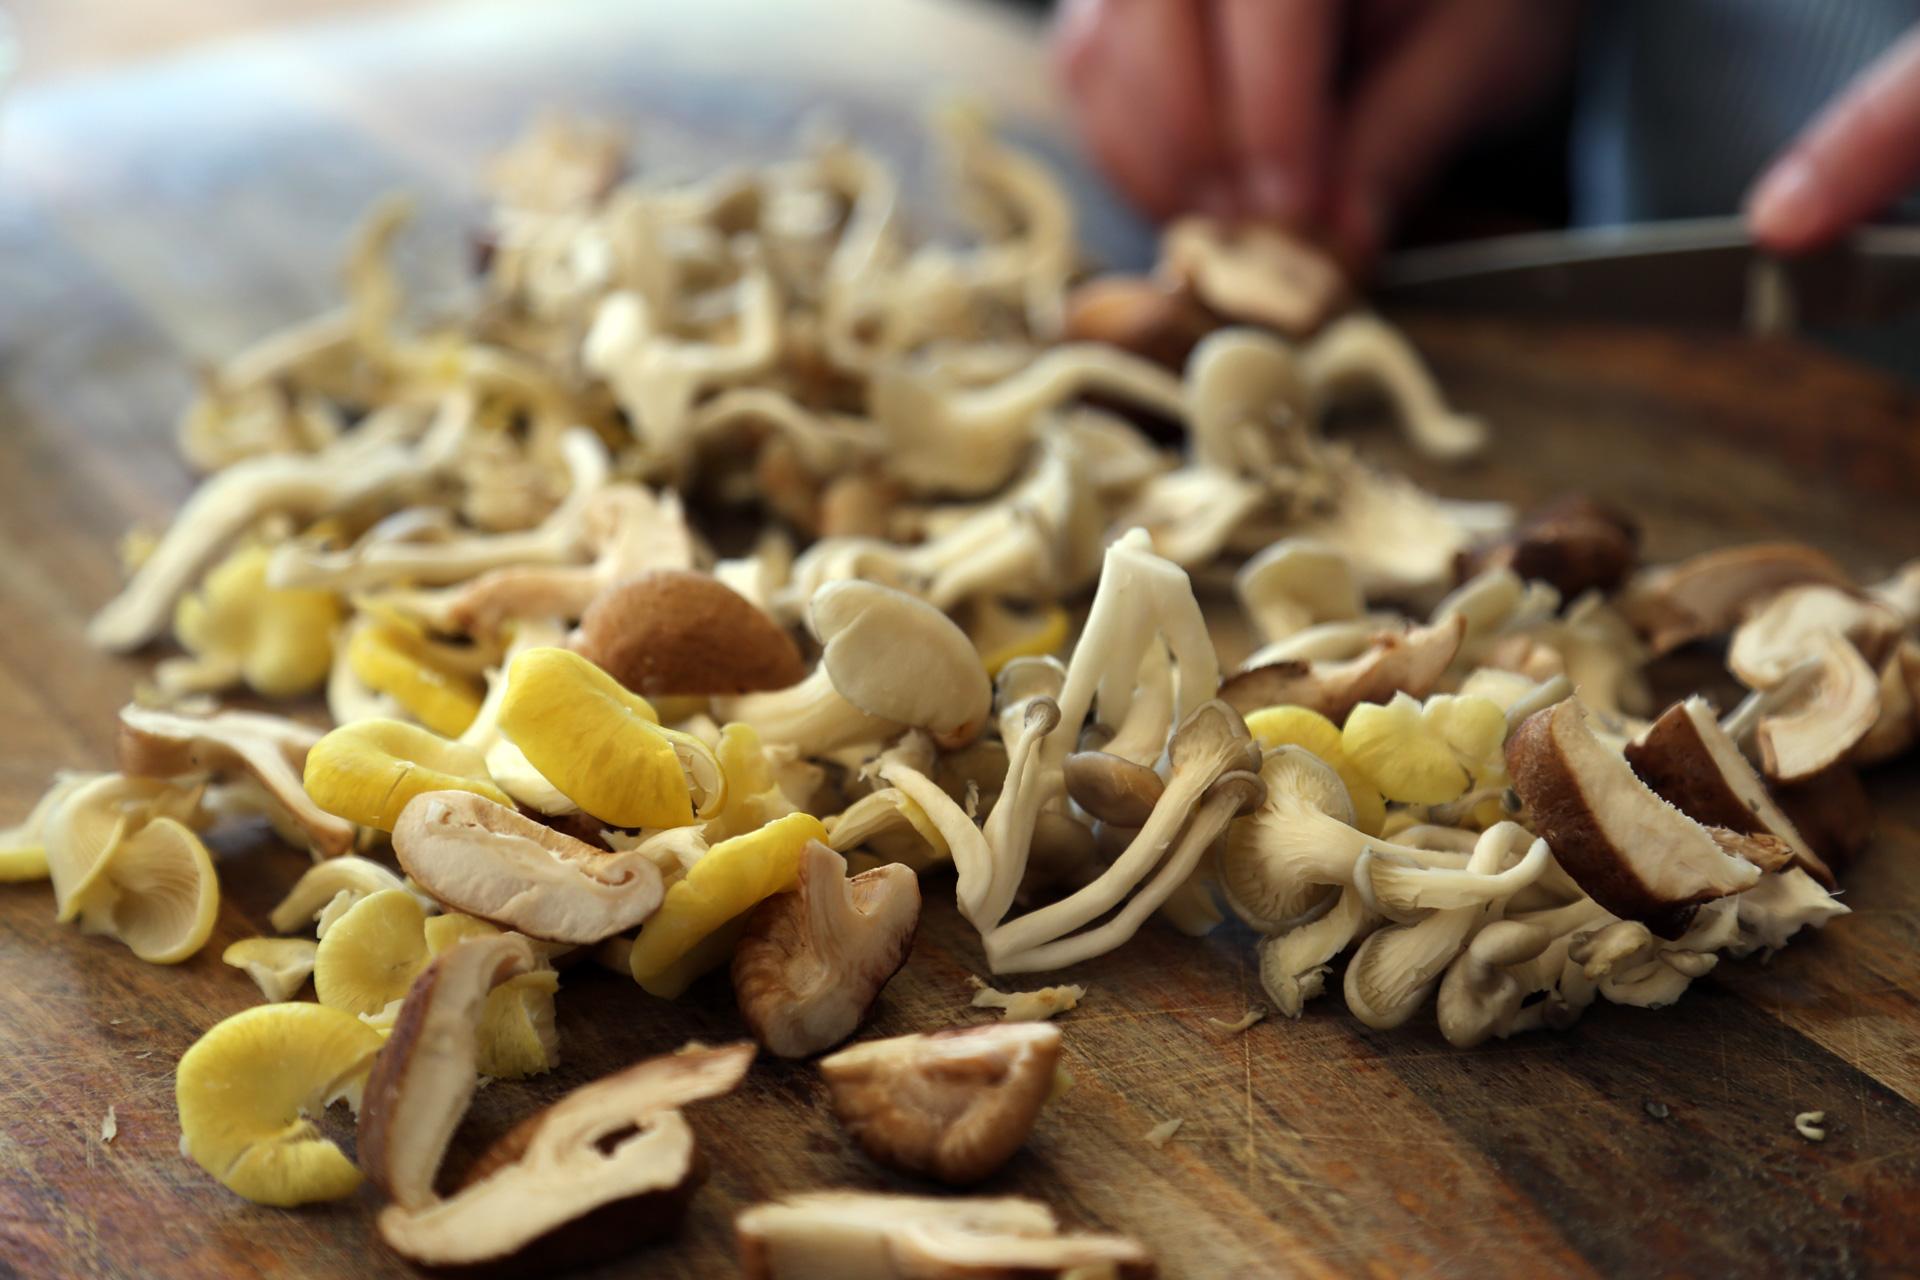 Chop the wild mushrooms